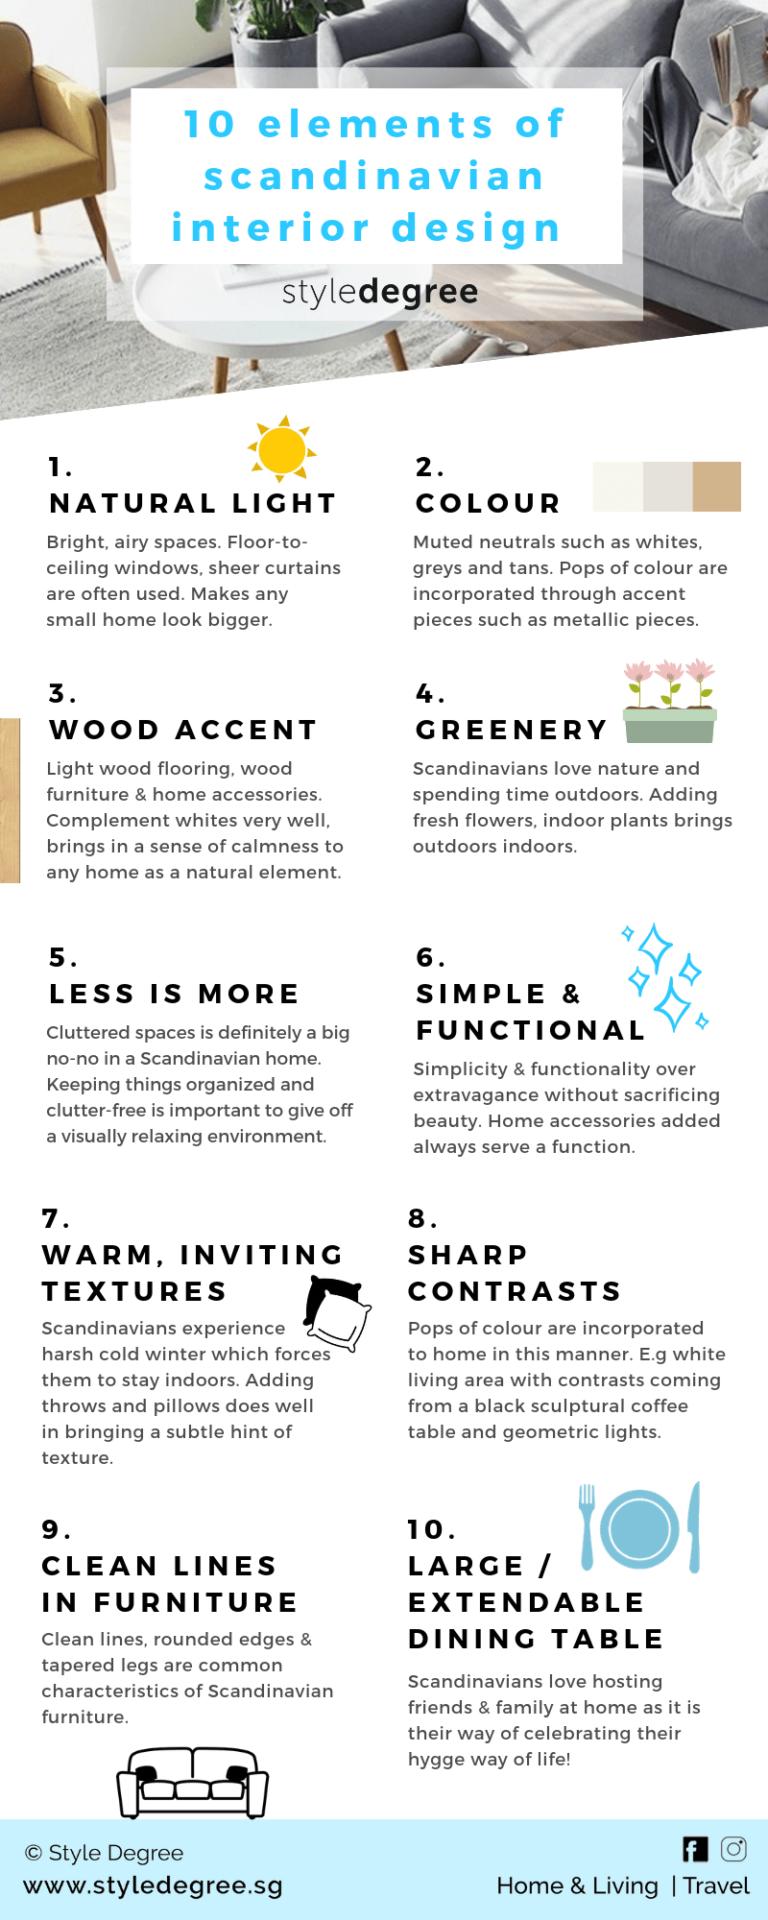 10 Elements Of Scandinavian Interior Design In Singapore HDB & Condos